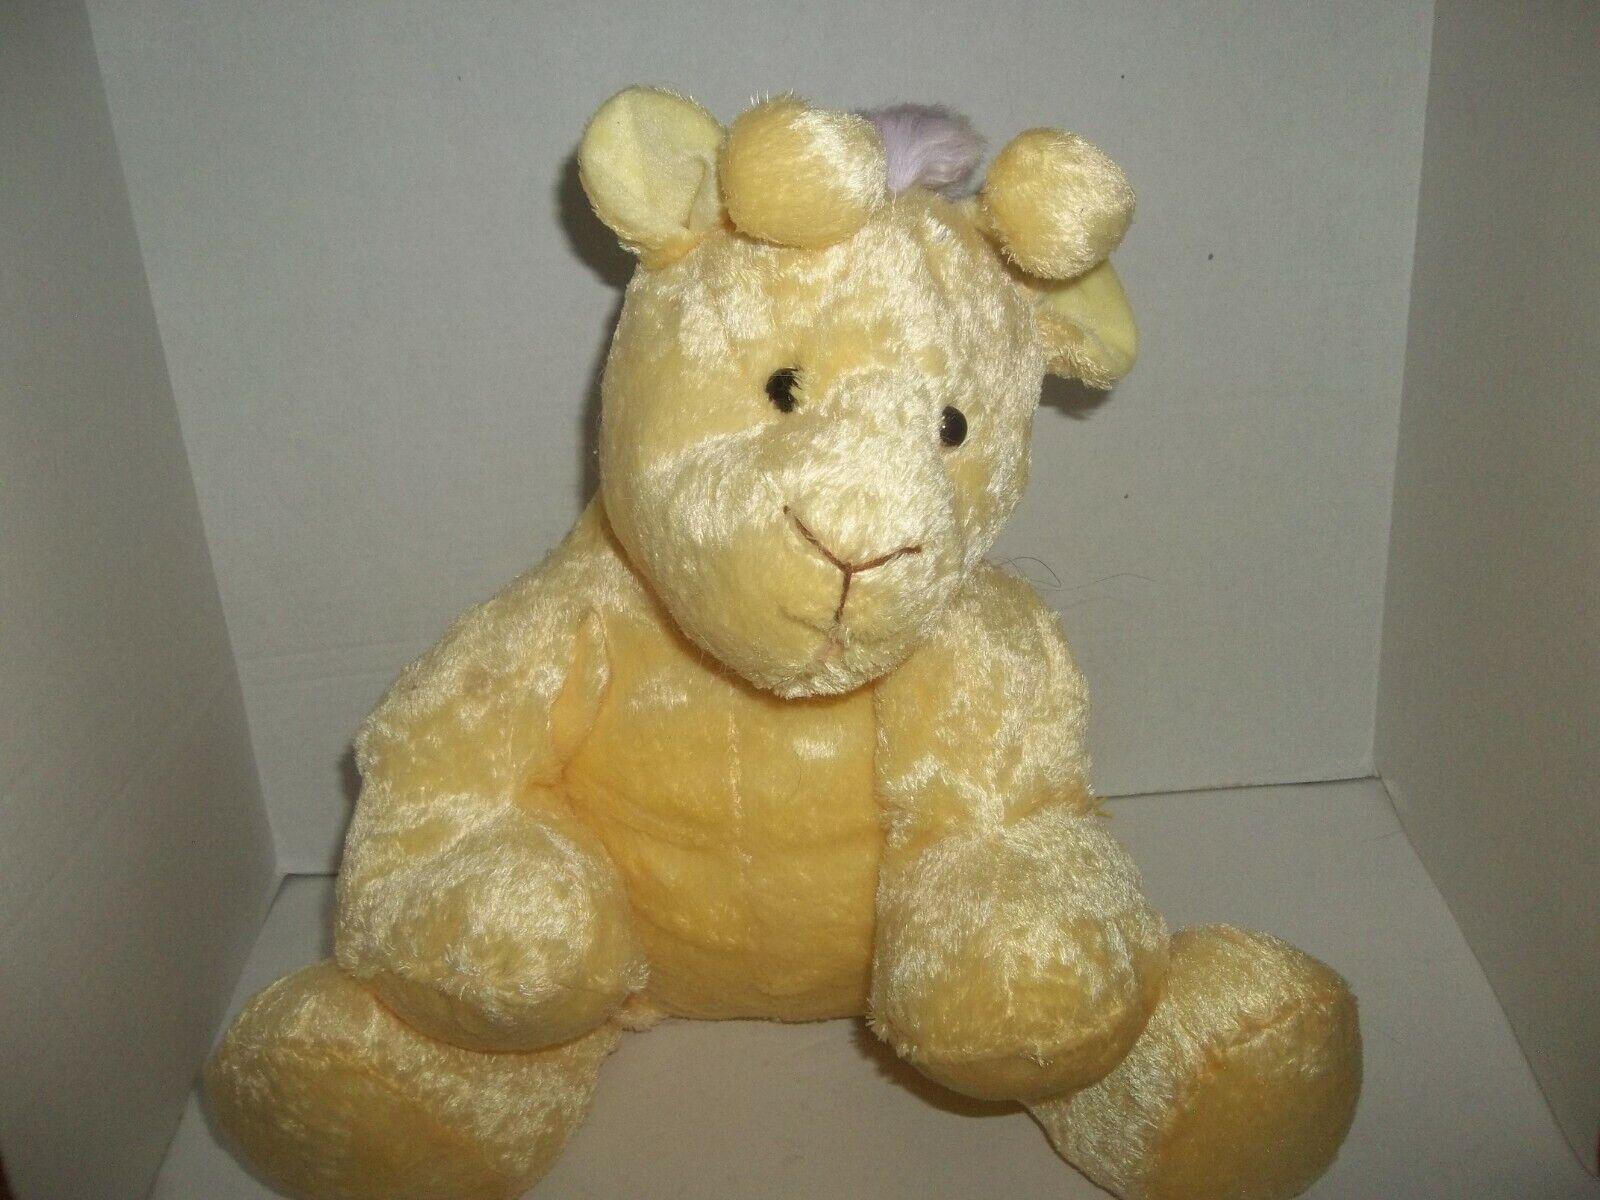 Best Made Toys Bunny Rabbit Baby//Child Rattle Plush Stuffed Animal NEW Target